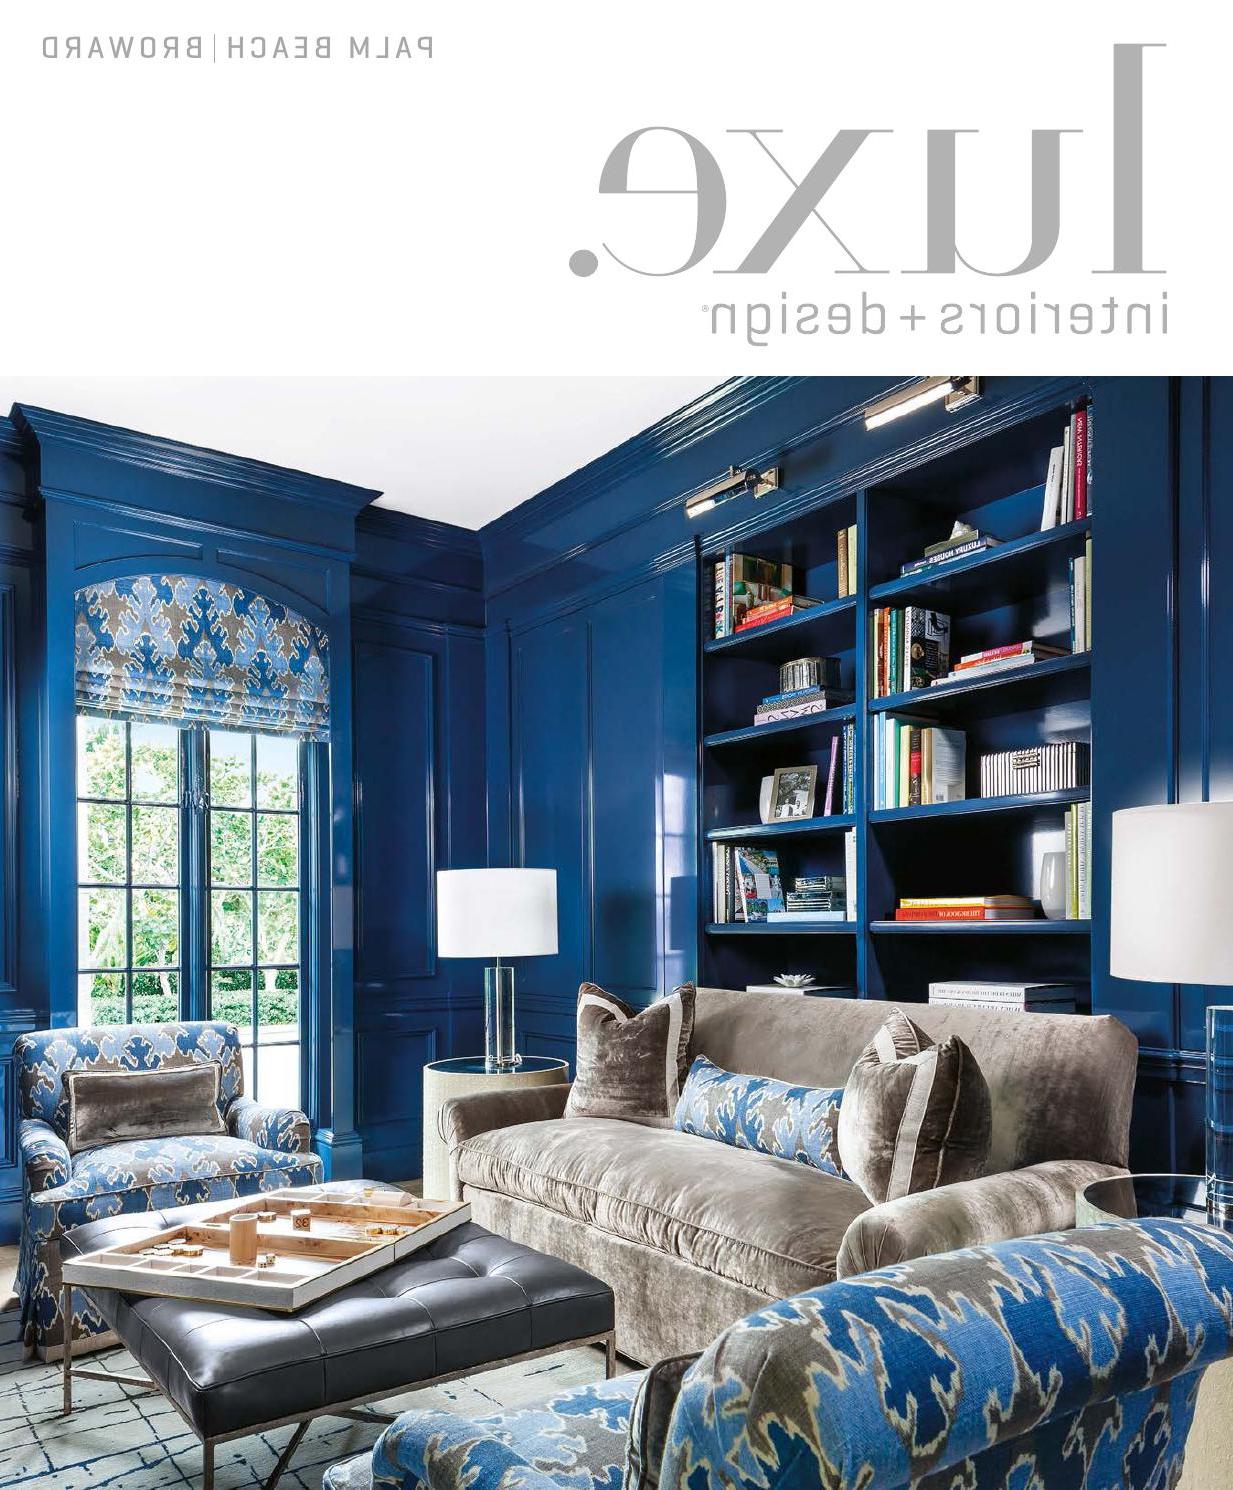 Popular Chadwick Tomato Swivel Accent Chairs Inside Luxe Magazine November 2015 Palm Beachsandow® – Issuu (View 15 of 20)